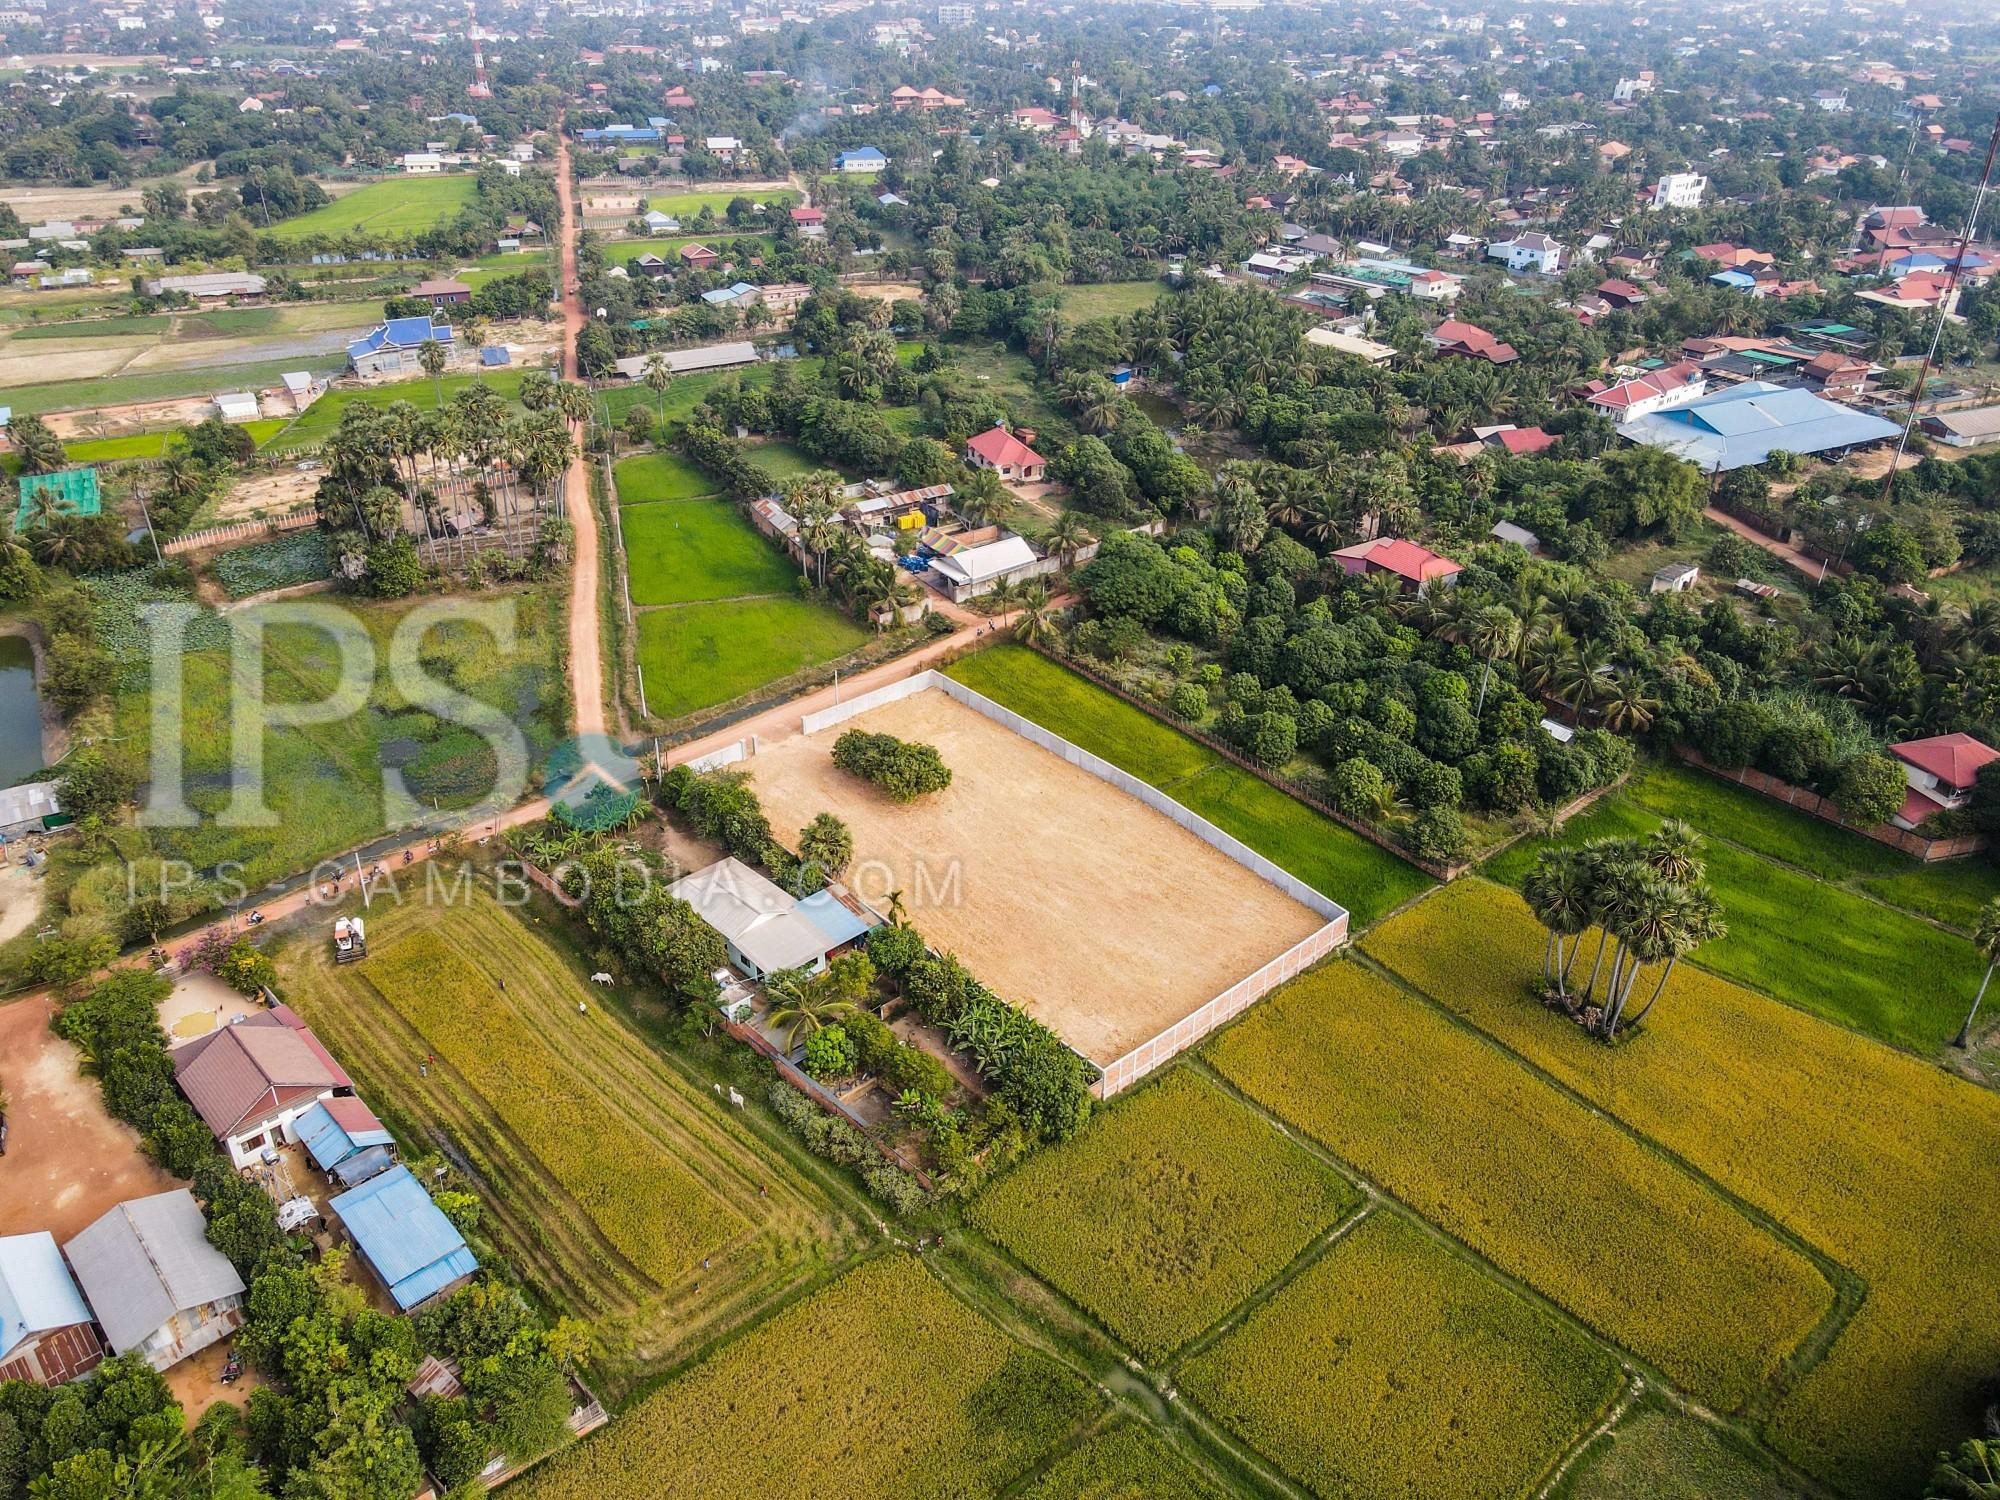 2837 Sqm Land For Sale - Wat Athvea, Siem Reap